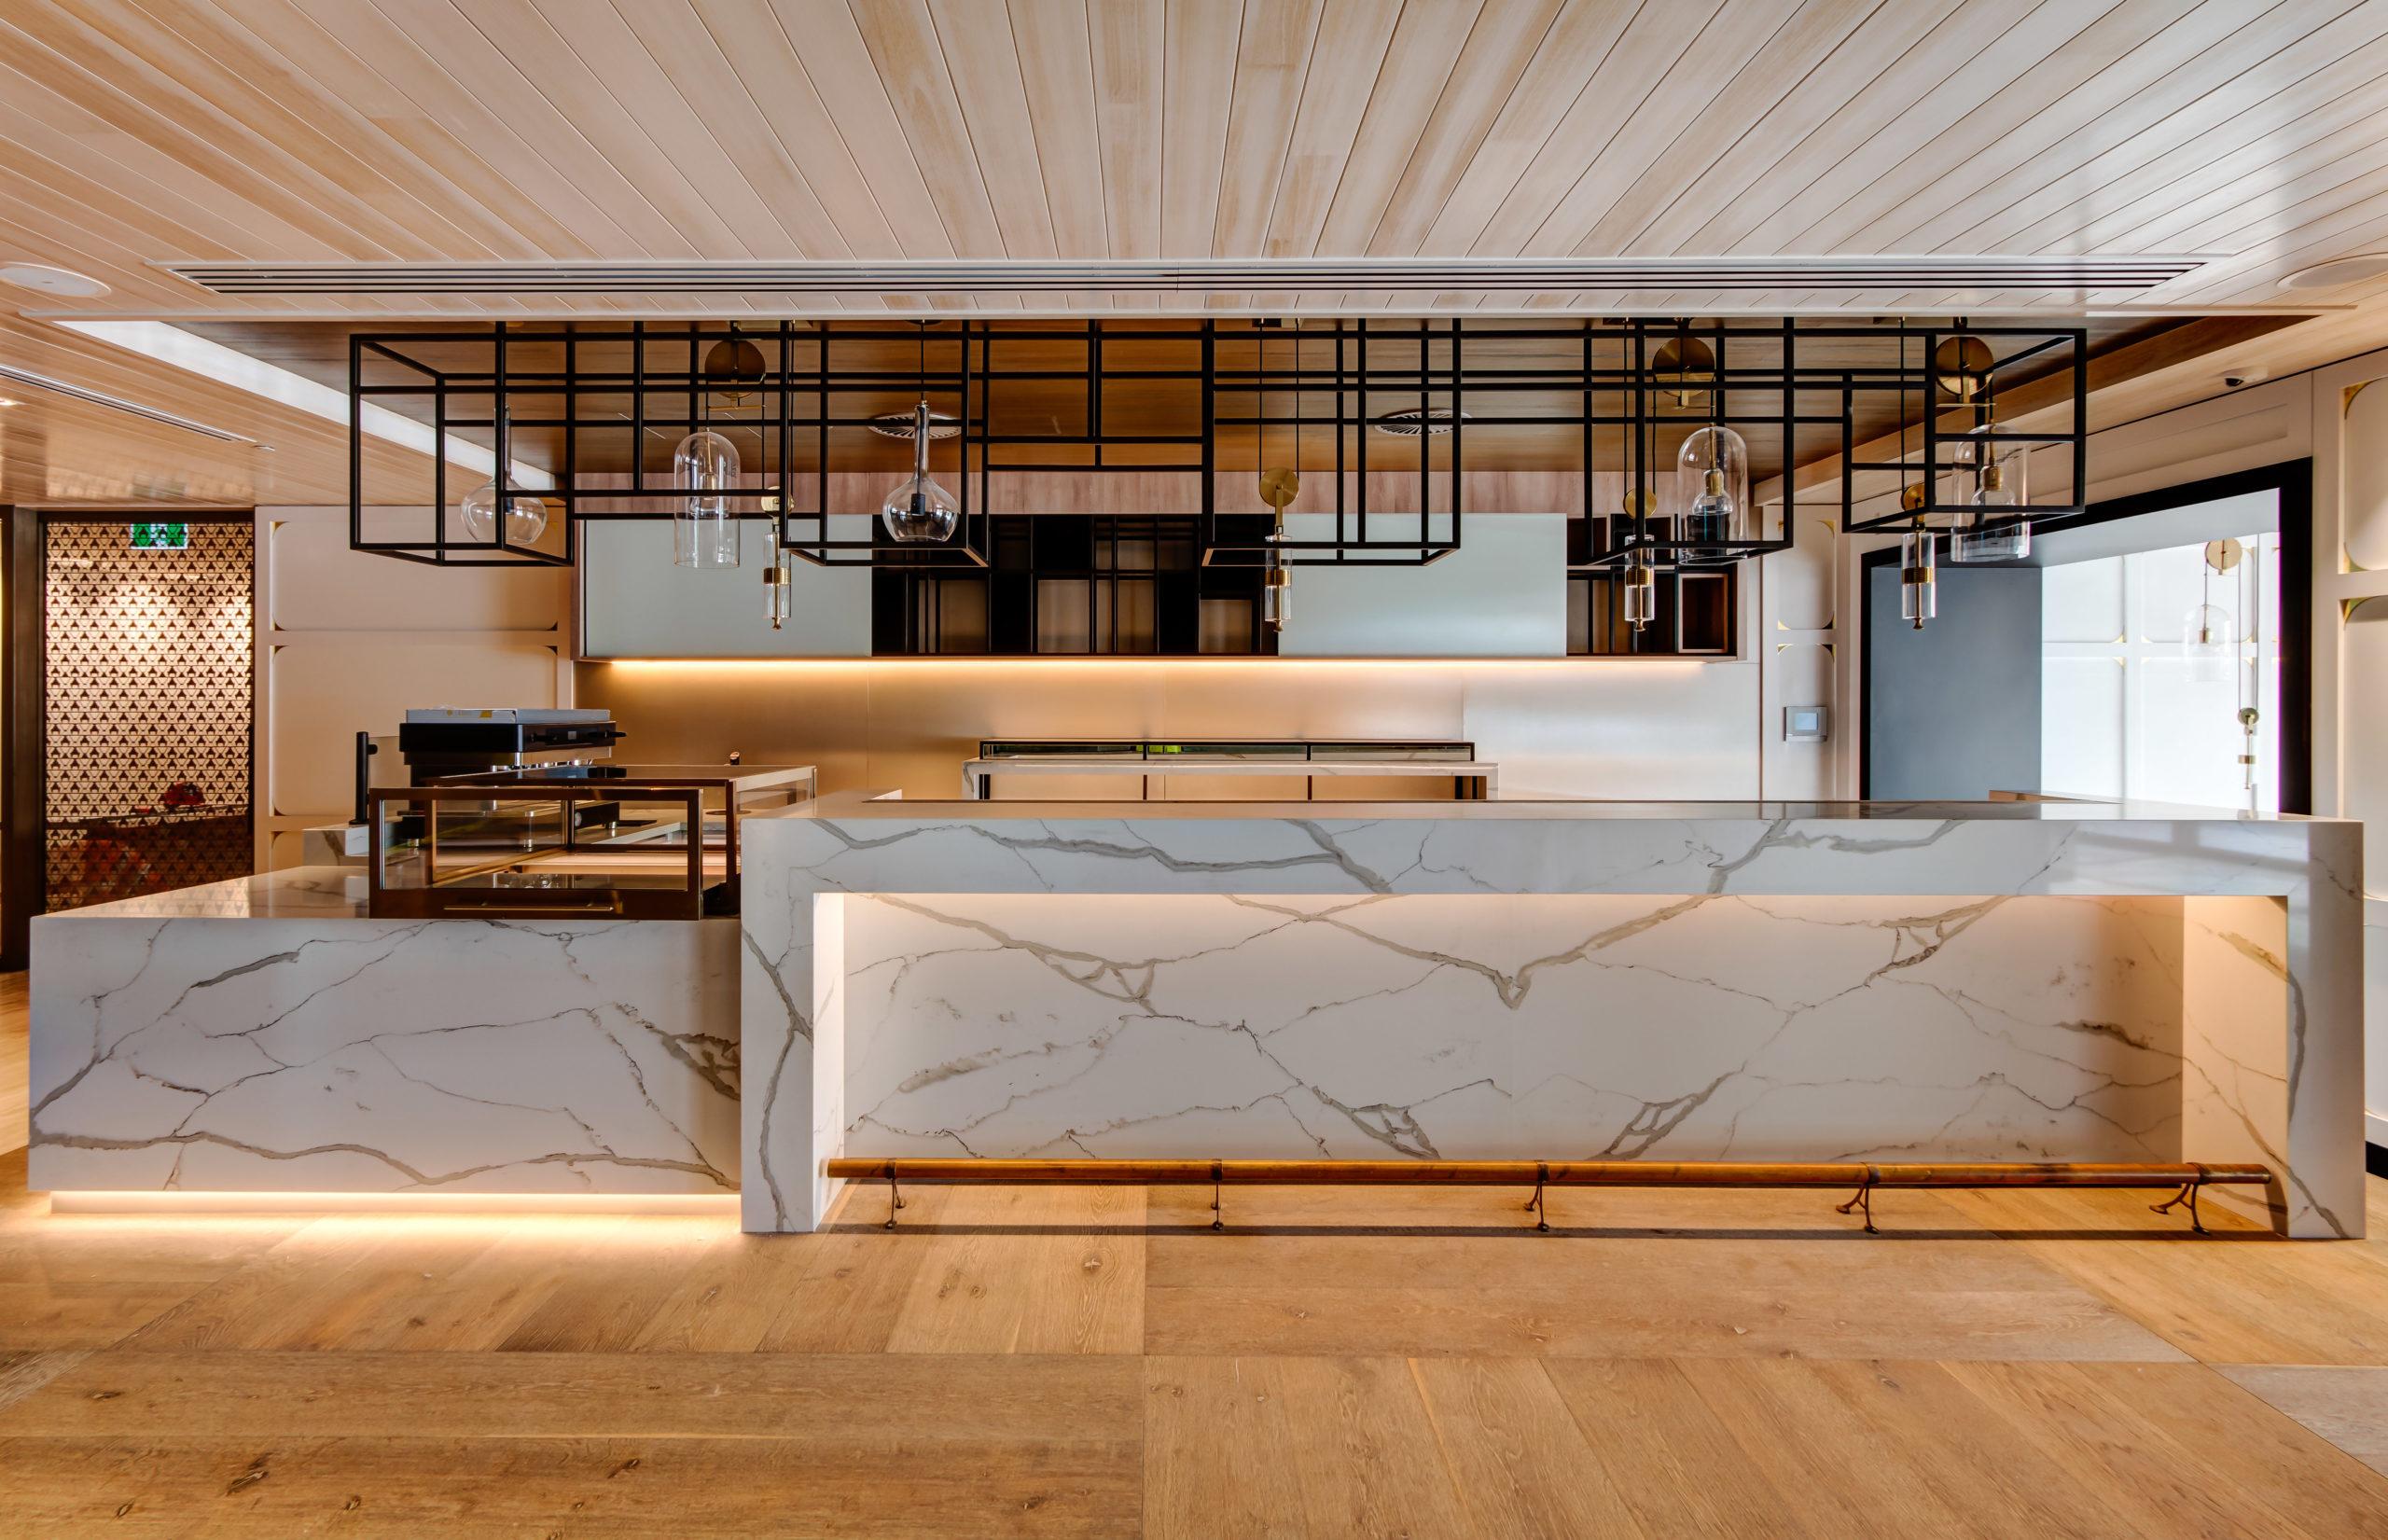 Intercontinental Hotel Kitchen Perth